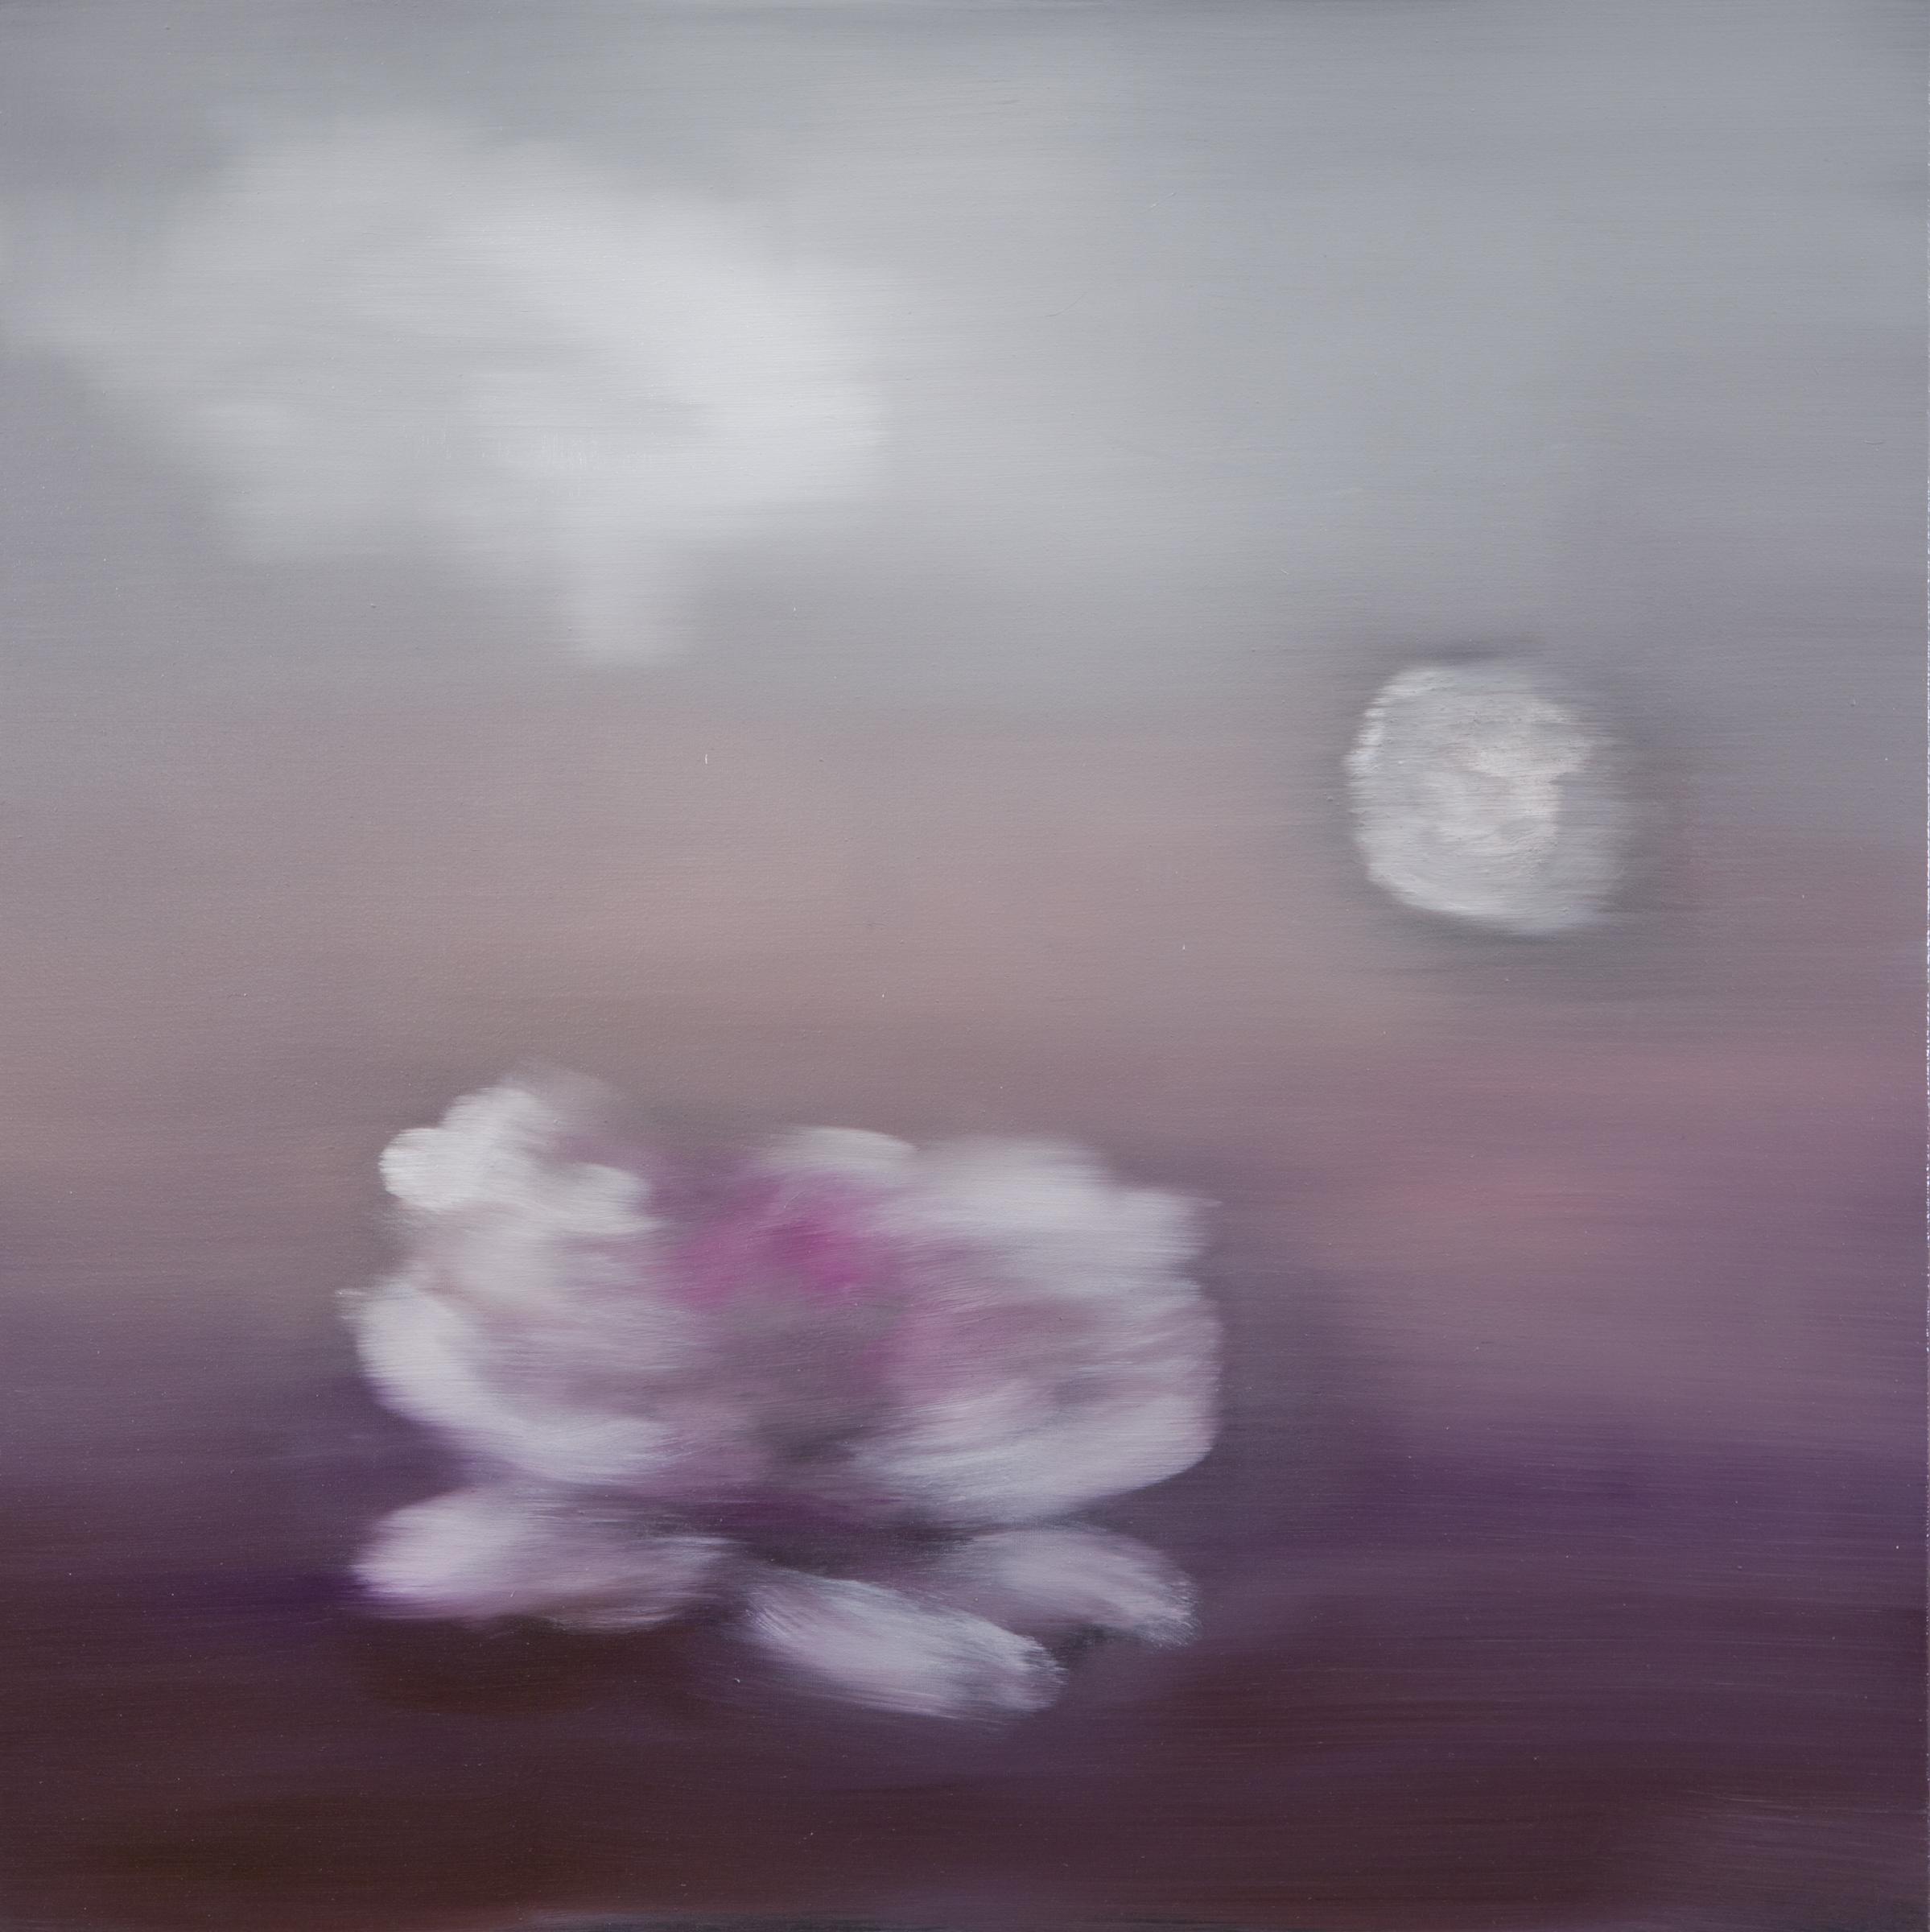 Ross Bleckner,  Untitled  2018 30 x 30 in Oil on canvas